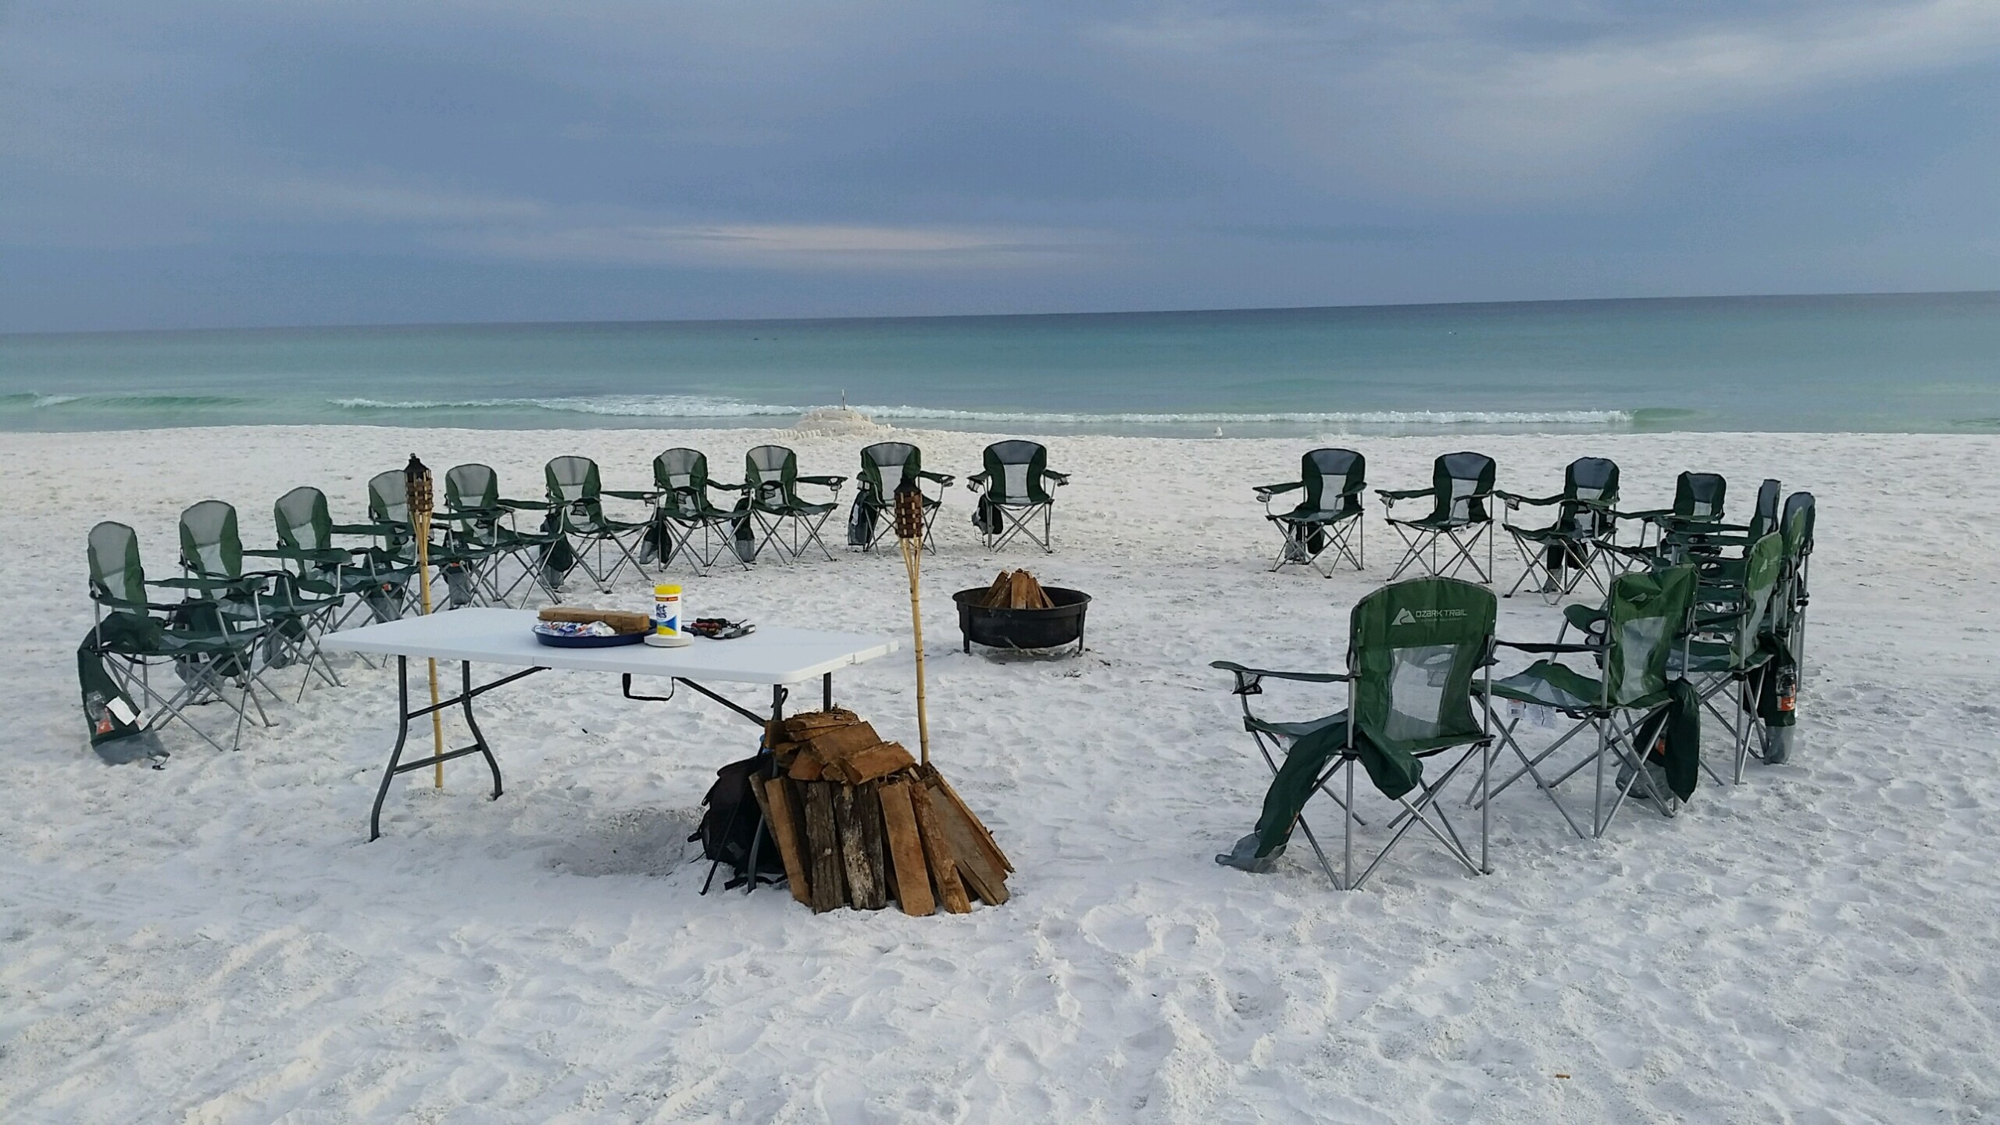 Bonfire on the beach in Destin